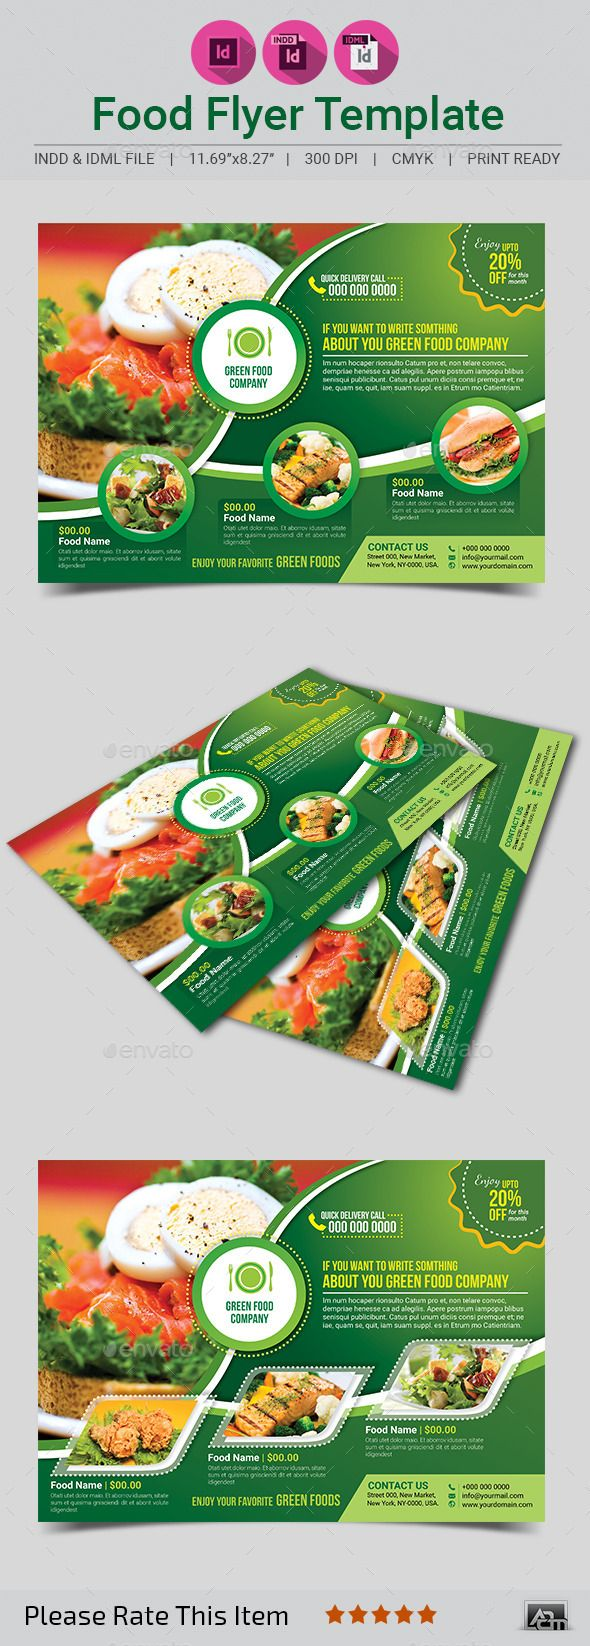 Green Food Flyer Template #design #foodflyer Download: http://graphicriver.net/item/green-food-flyer-template/11564056?ref=ksioks